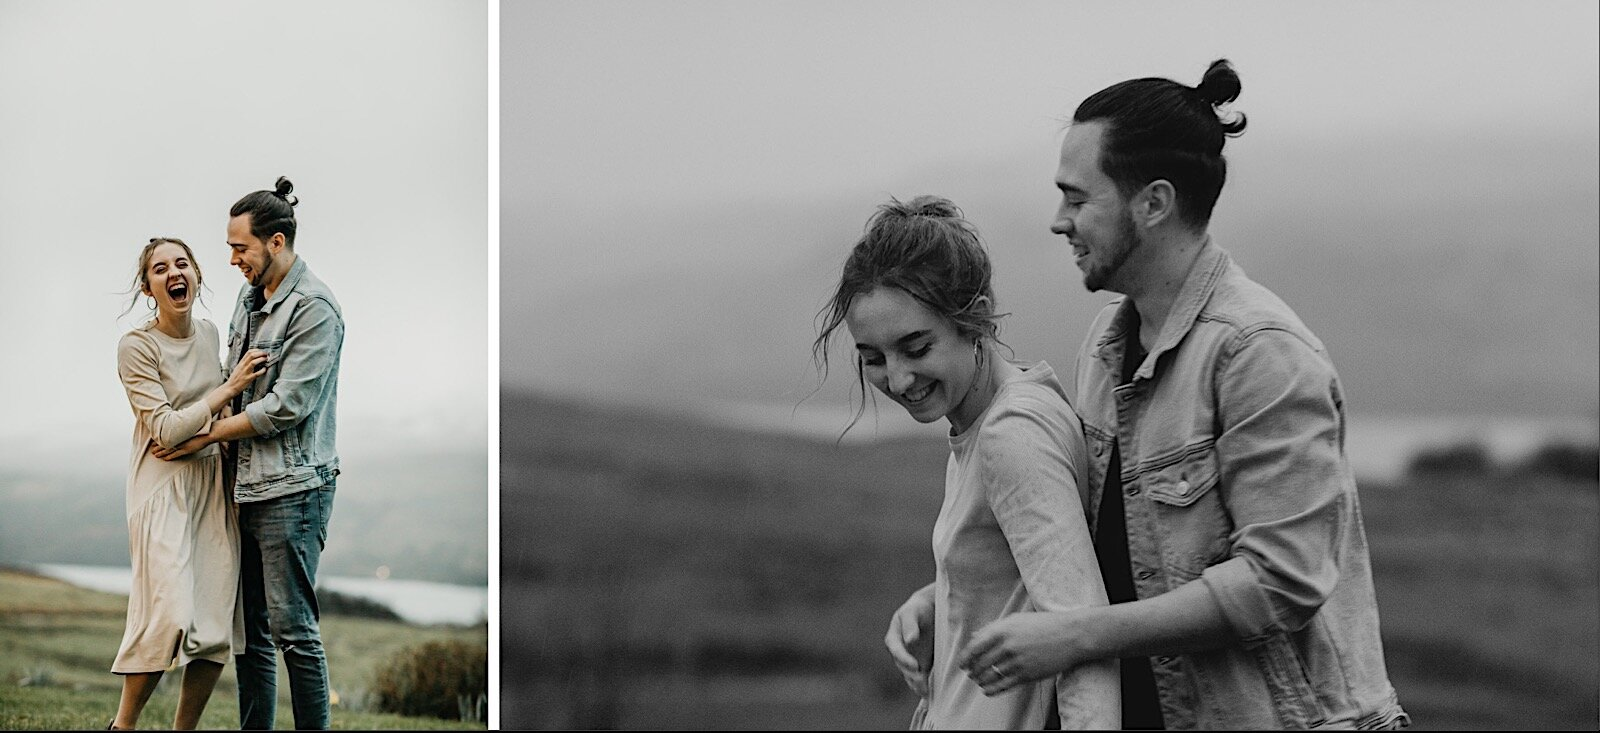 04_scotland_couple_shoot_lety_photography (11 von 36)_scotland_couple_shoot_lety_photography (13 von 36).jpg